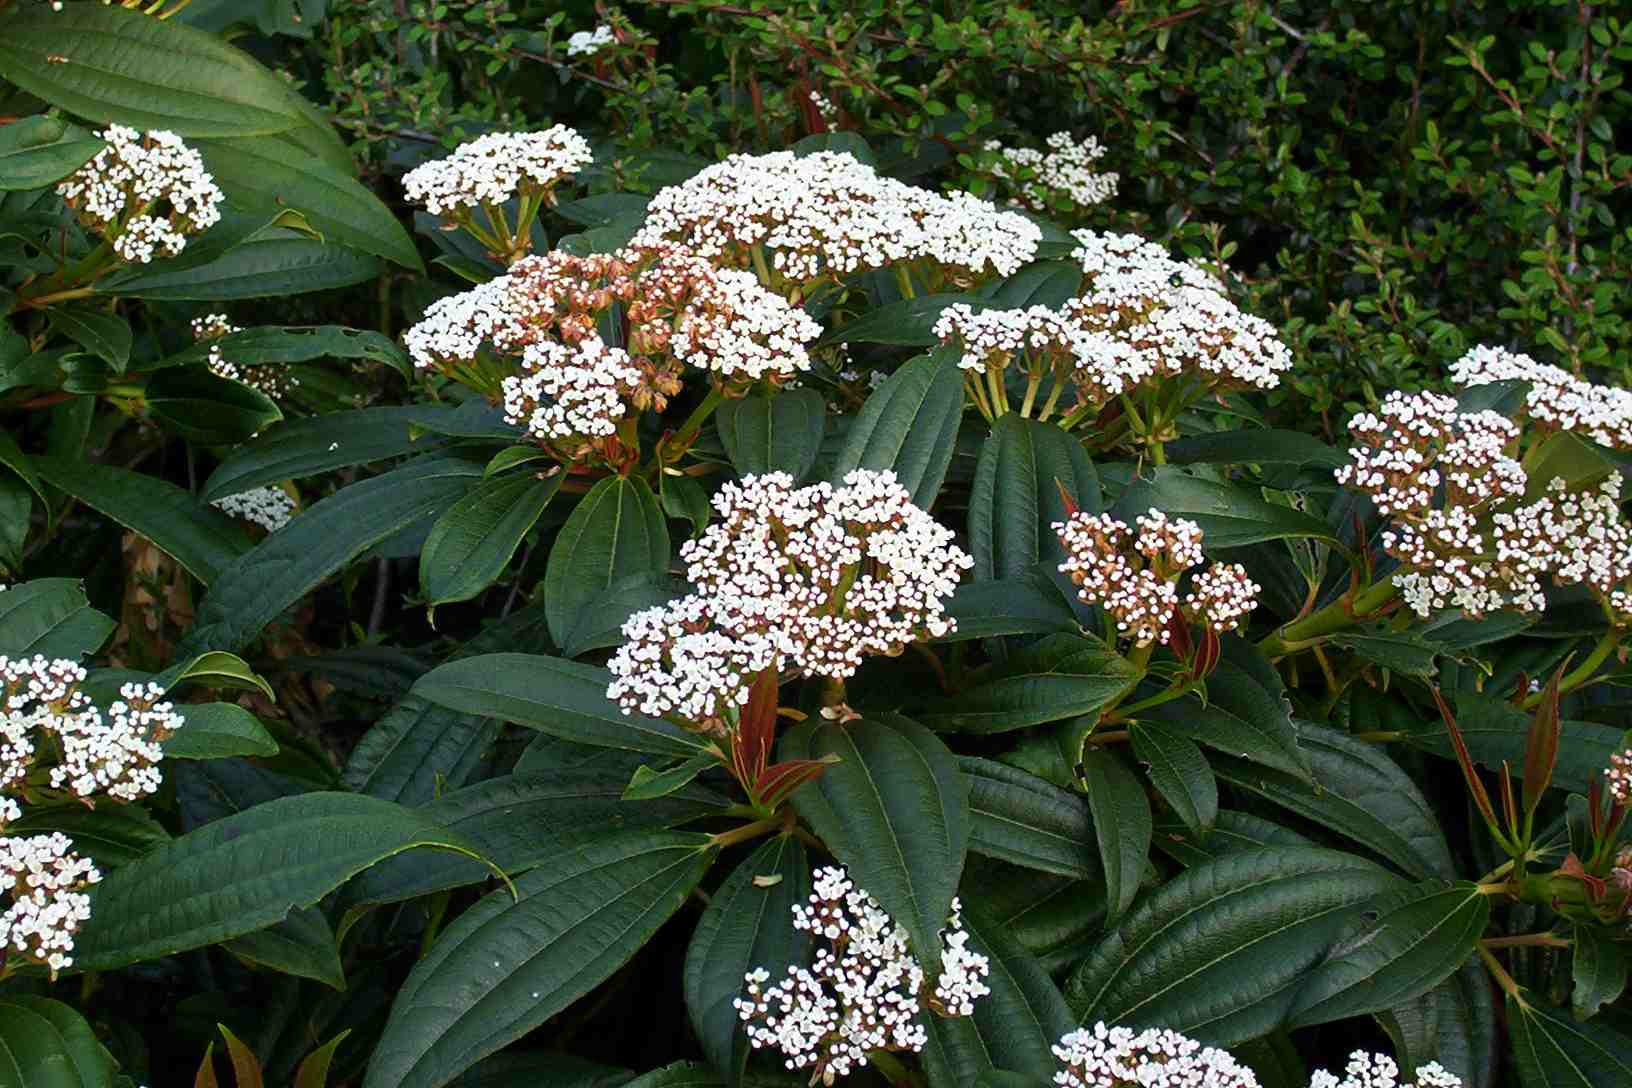 white flower plants that are part of the viburnum genus